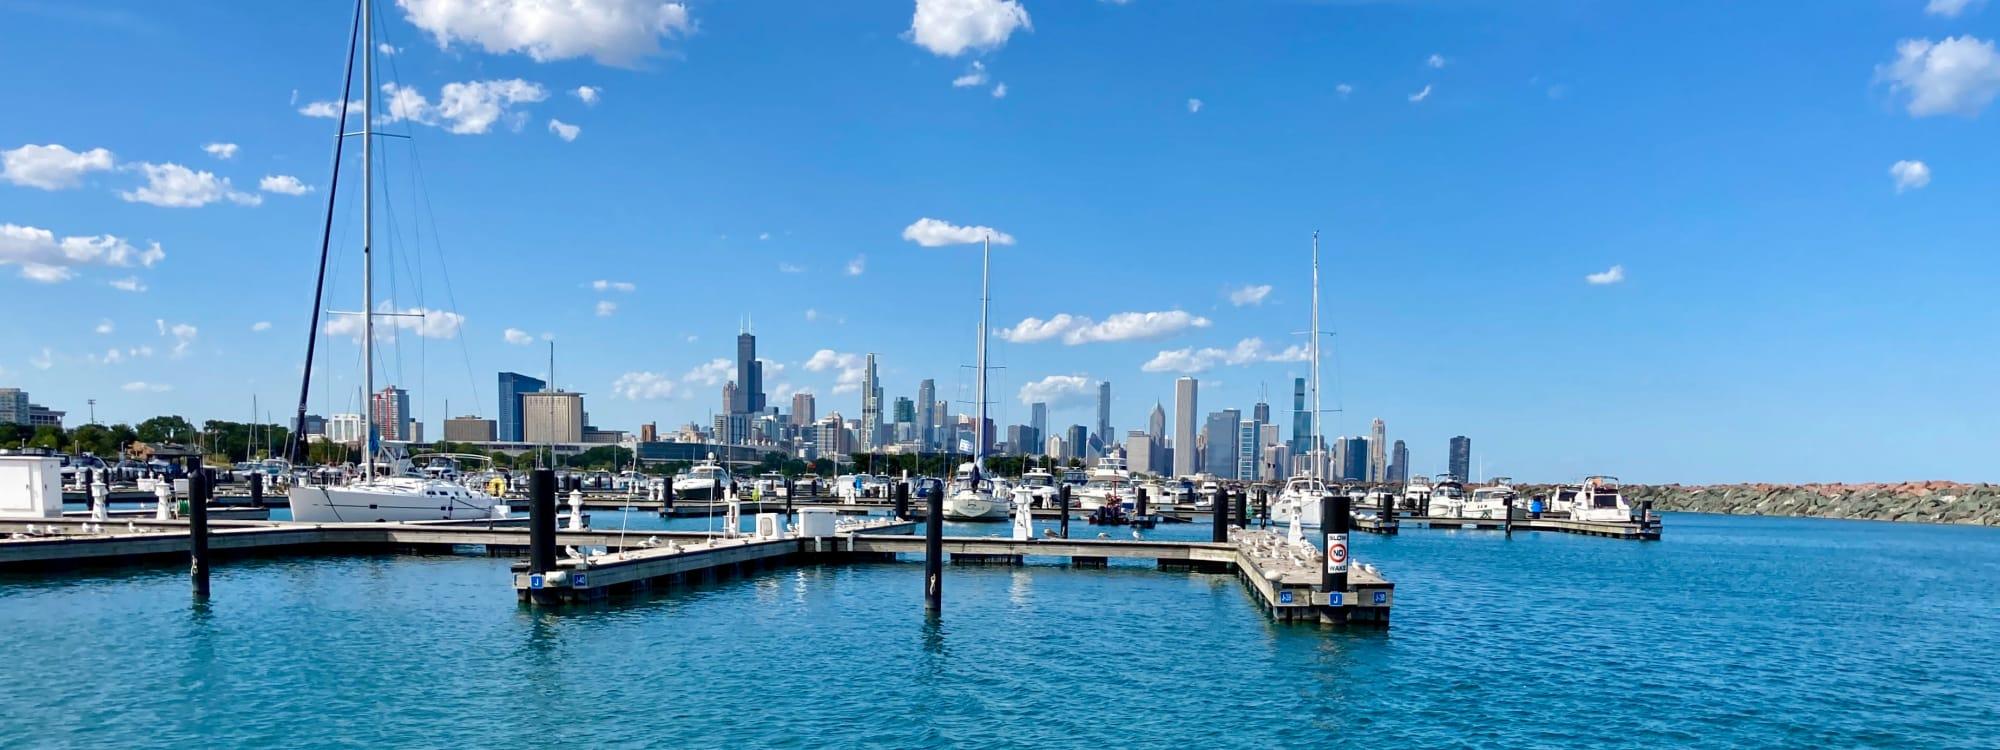 Neighborhood near Prairie Shores in Chicago, Illinois